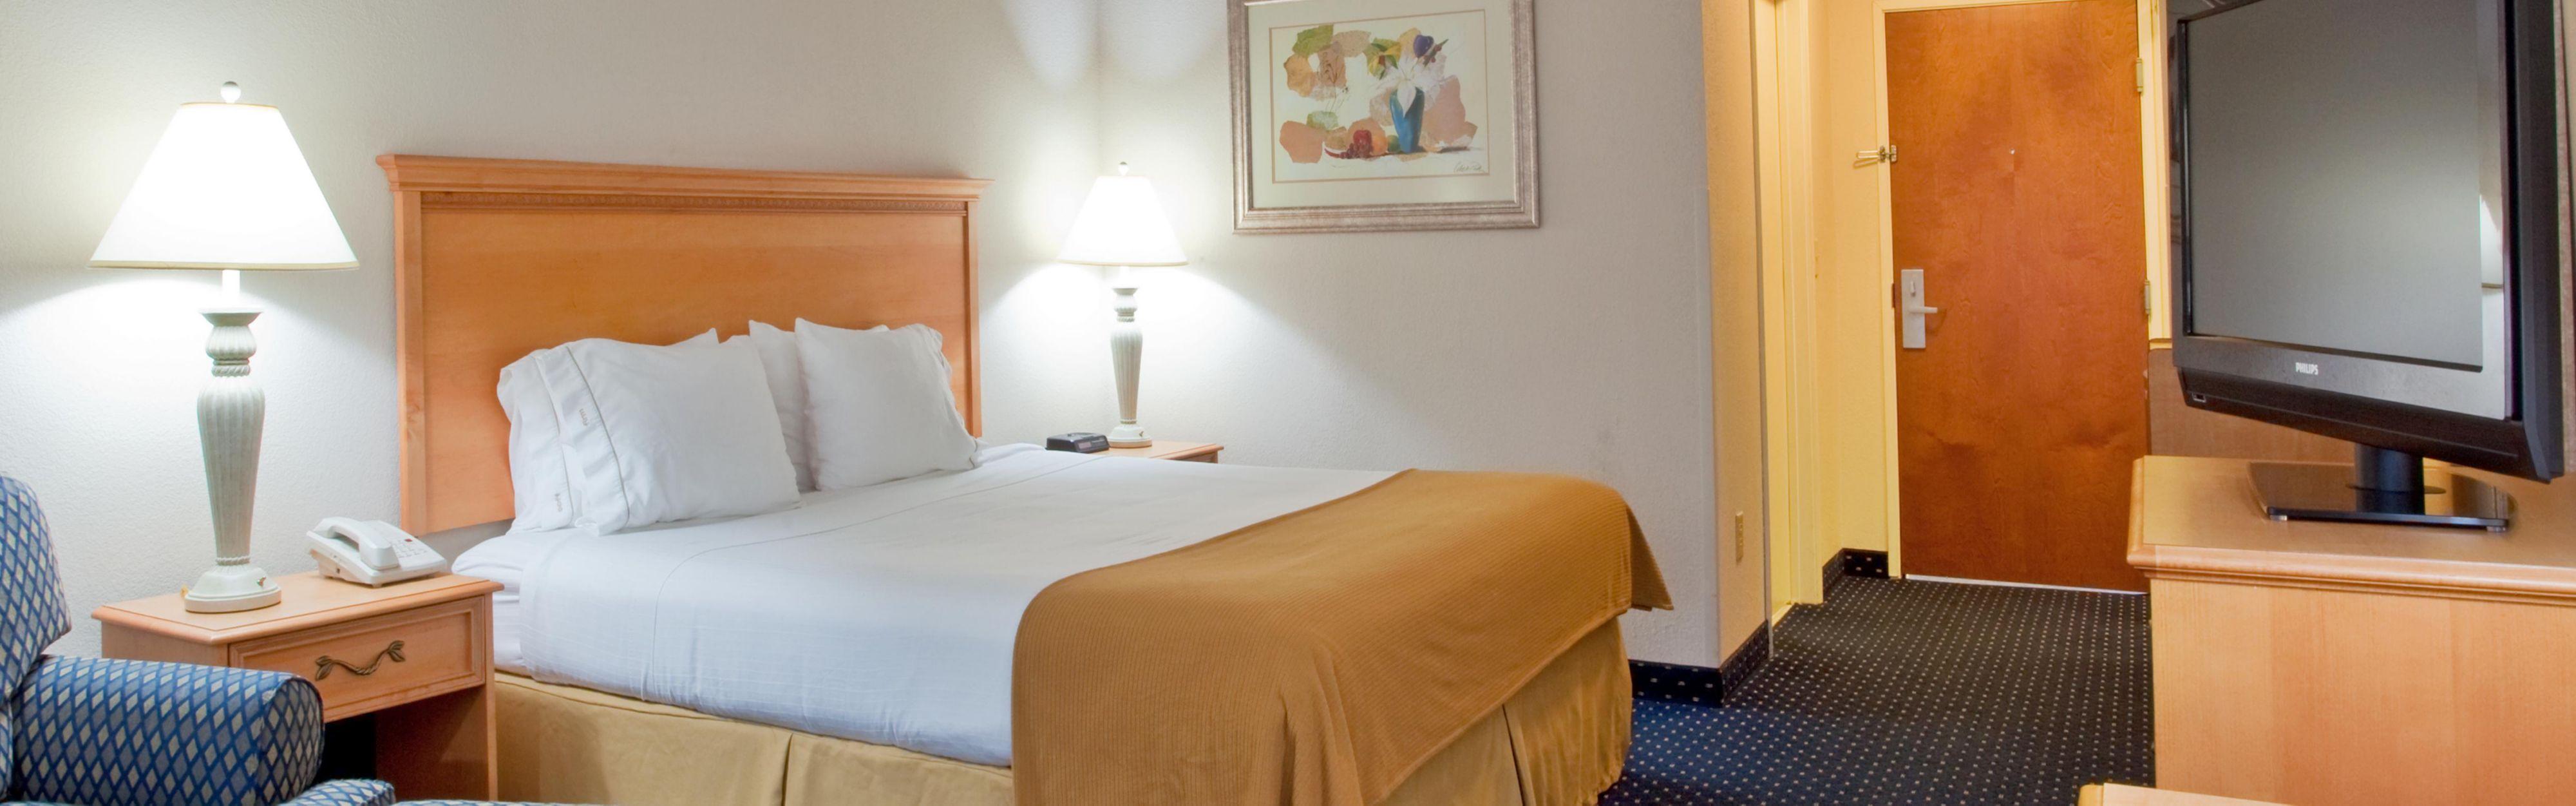 Holiday Inn Express & Suites Richmond North Ashland image 1